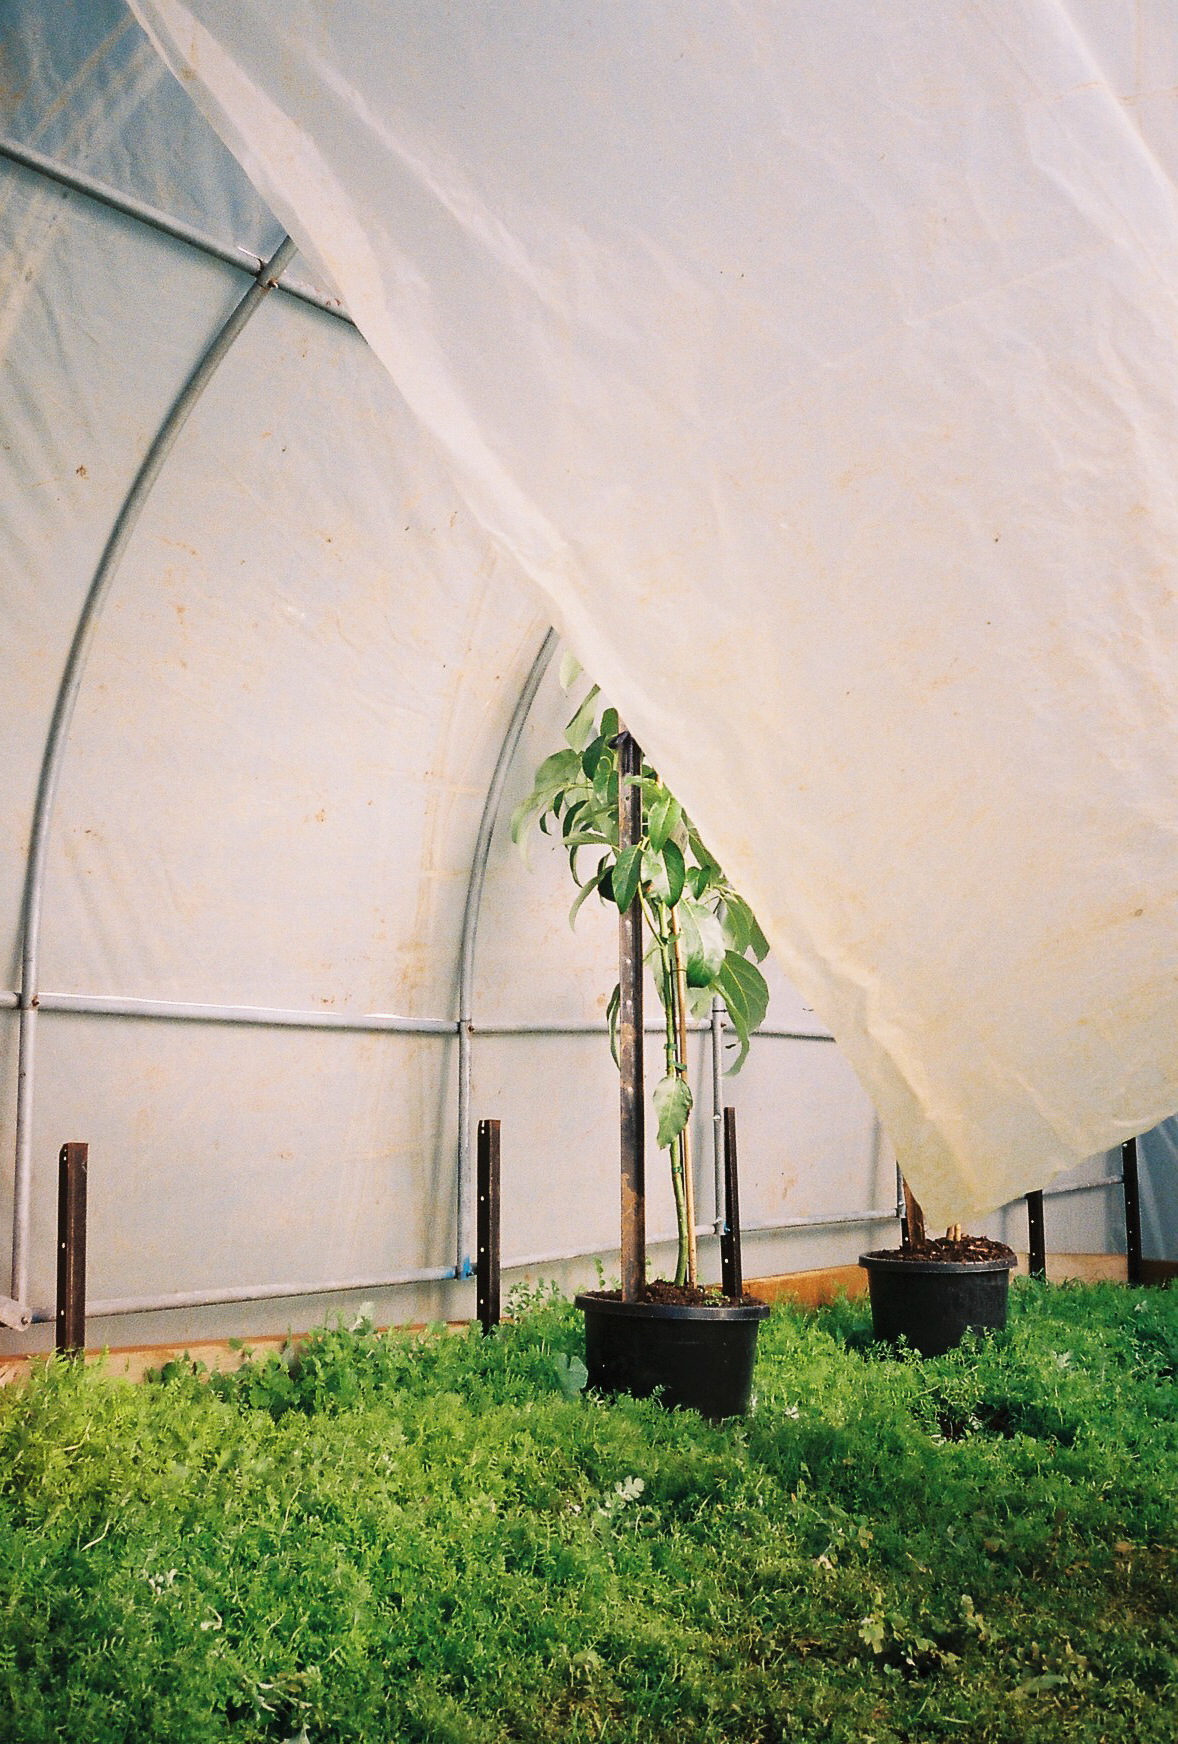 The greenhouse in Mark's home veggie garden.